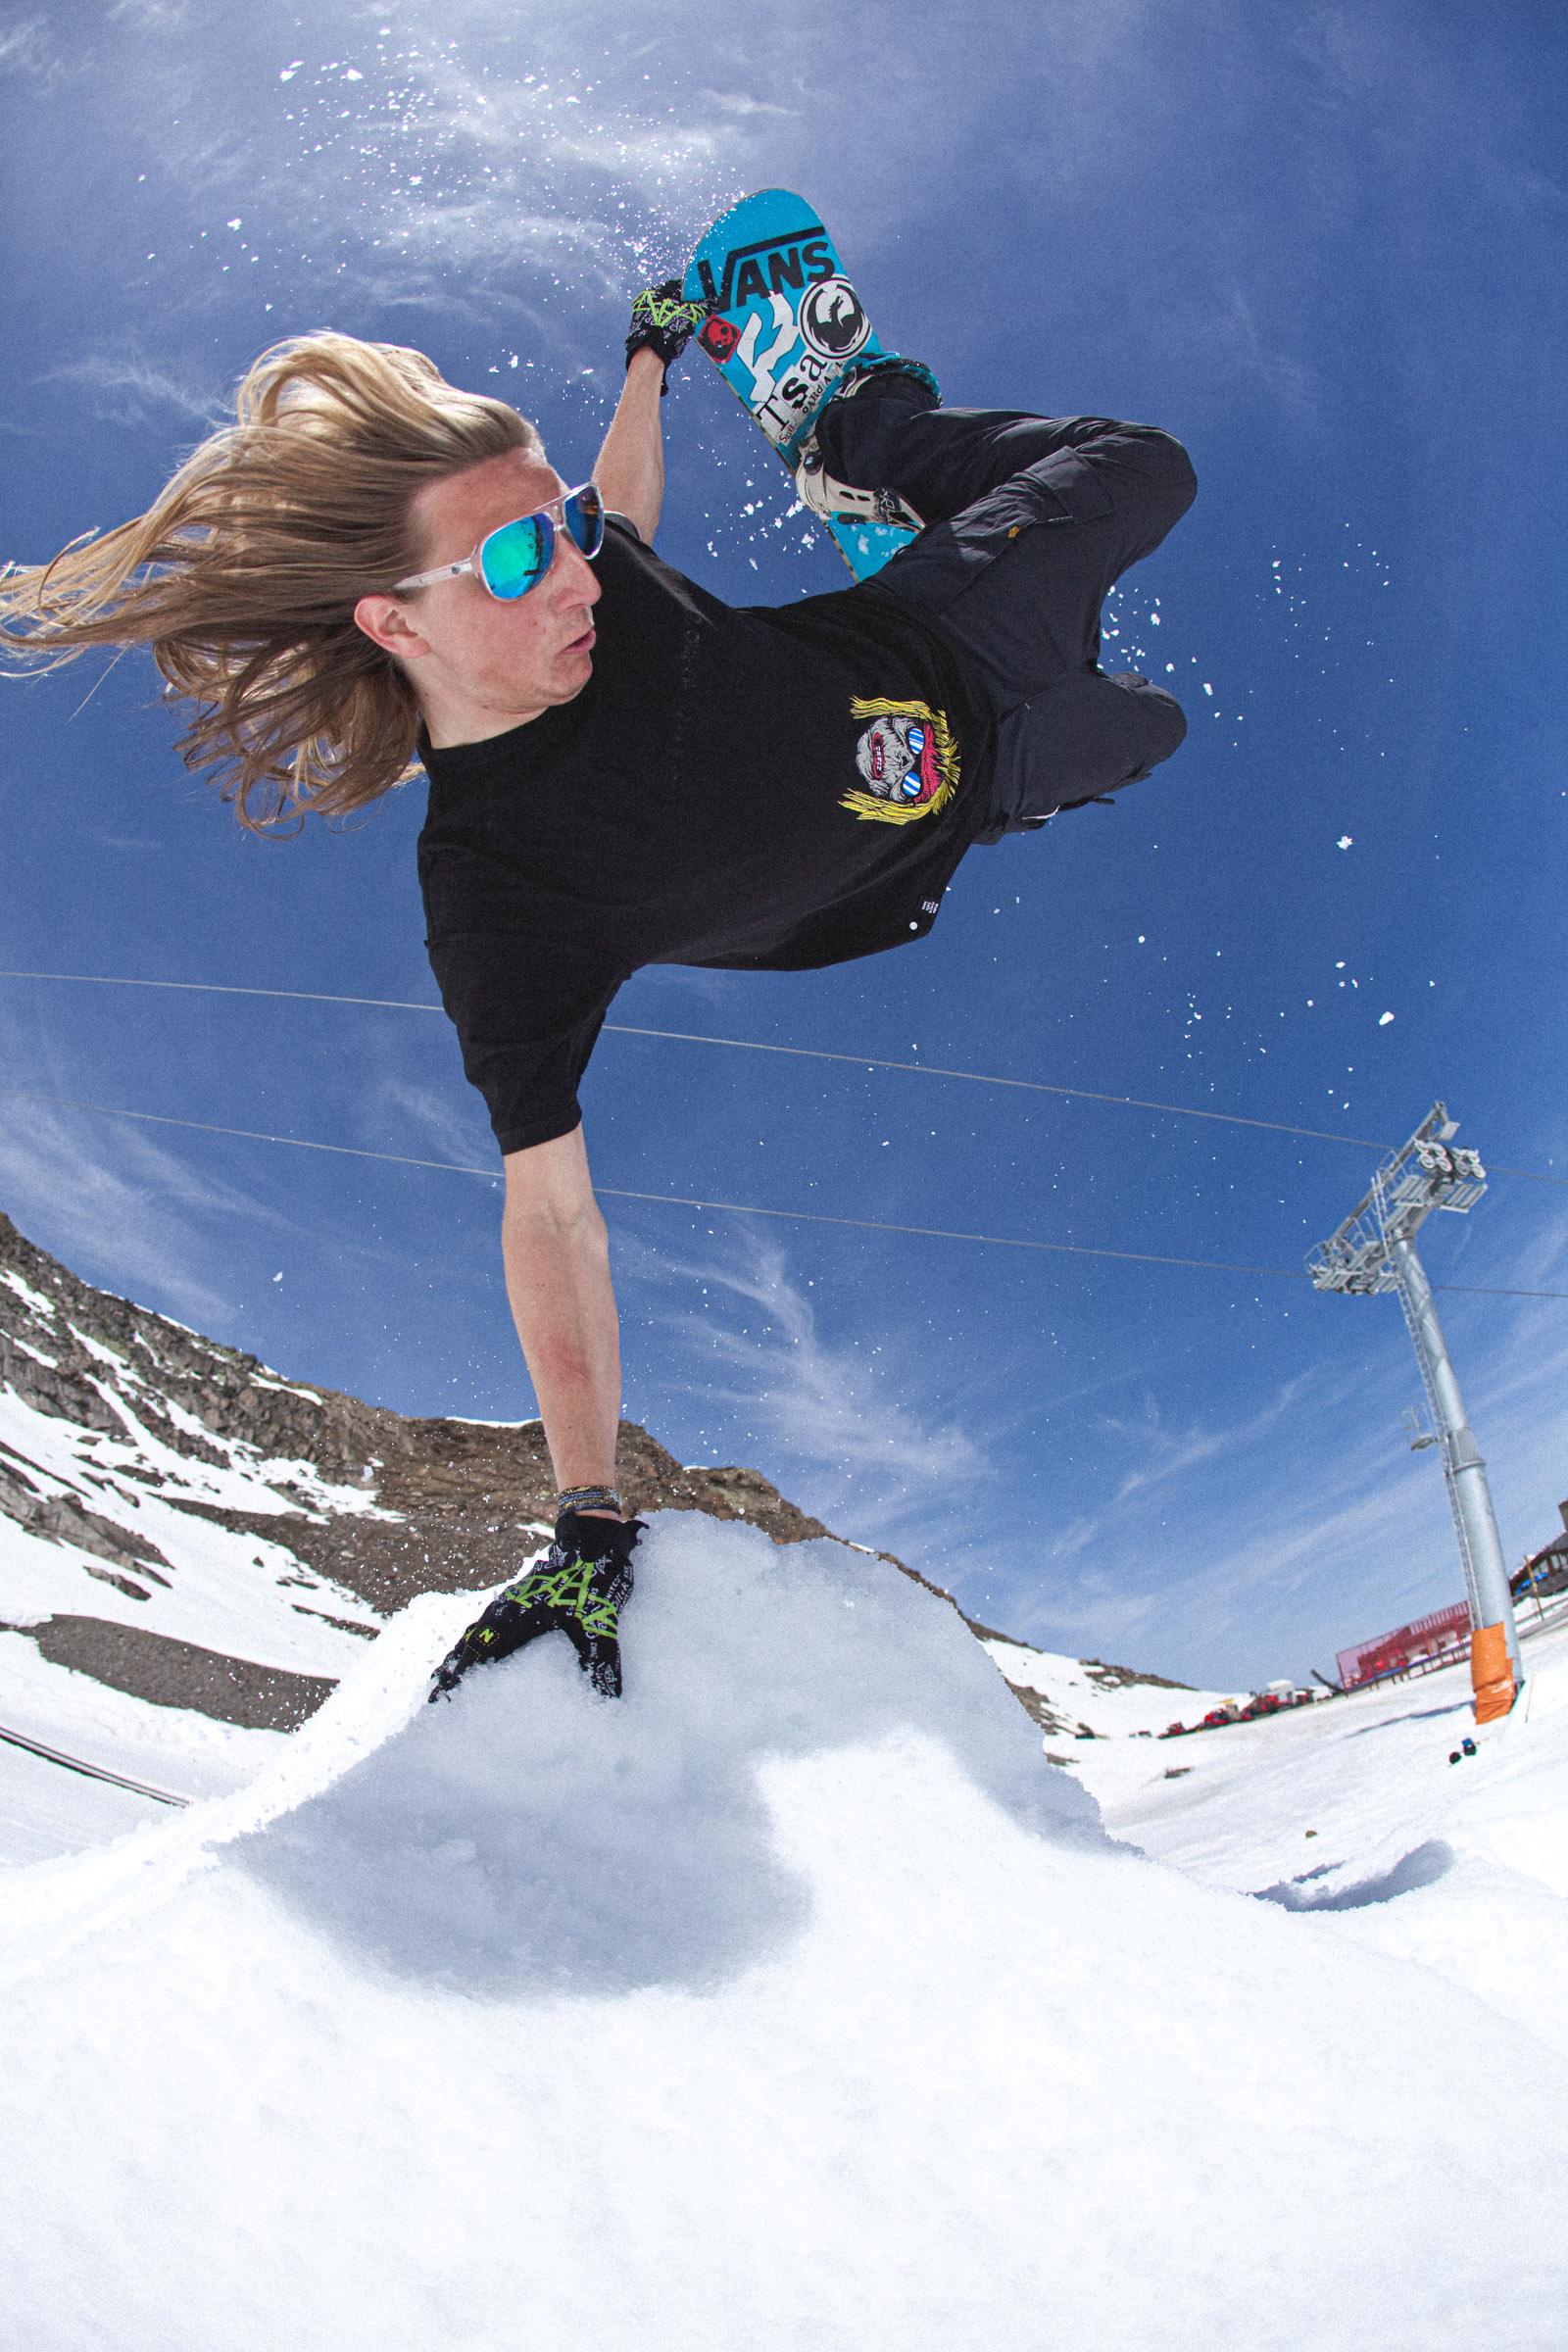 Action - Snowboarding, Austria